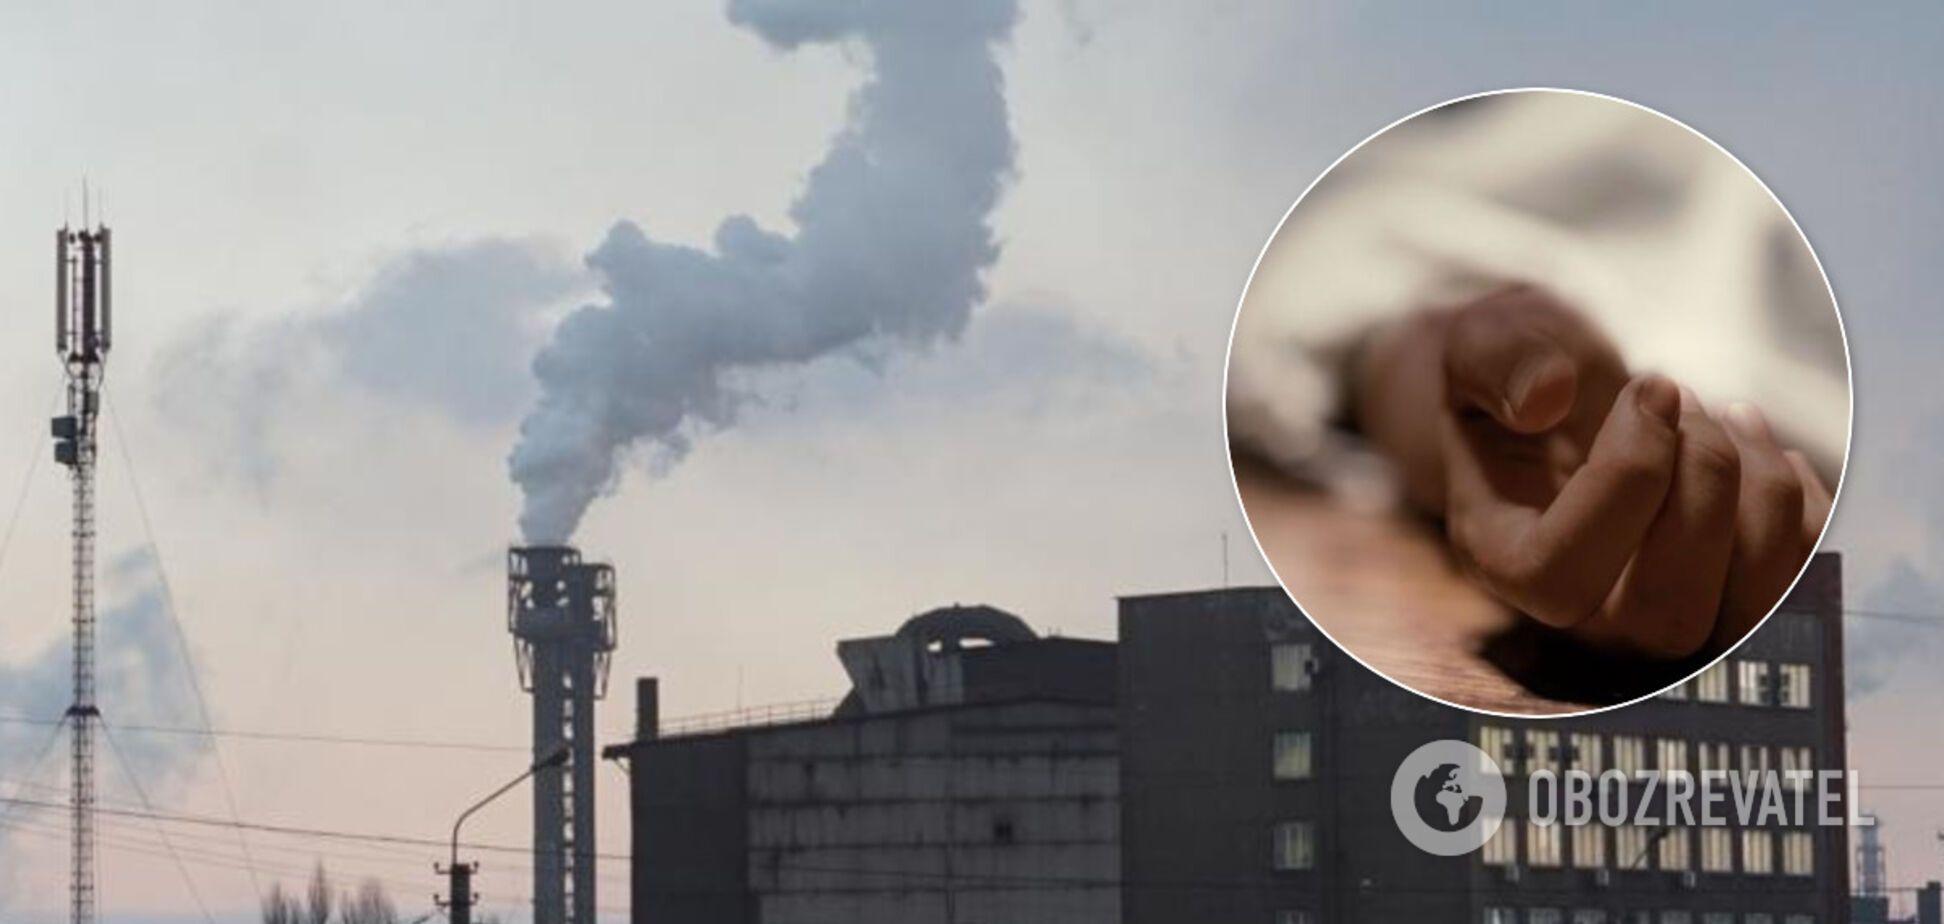 Под Днепром на заводе трагически погиб мужчина: все подробности ЧП